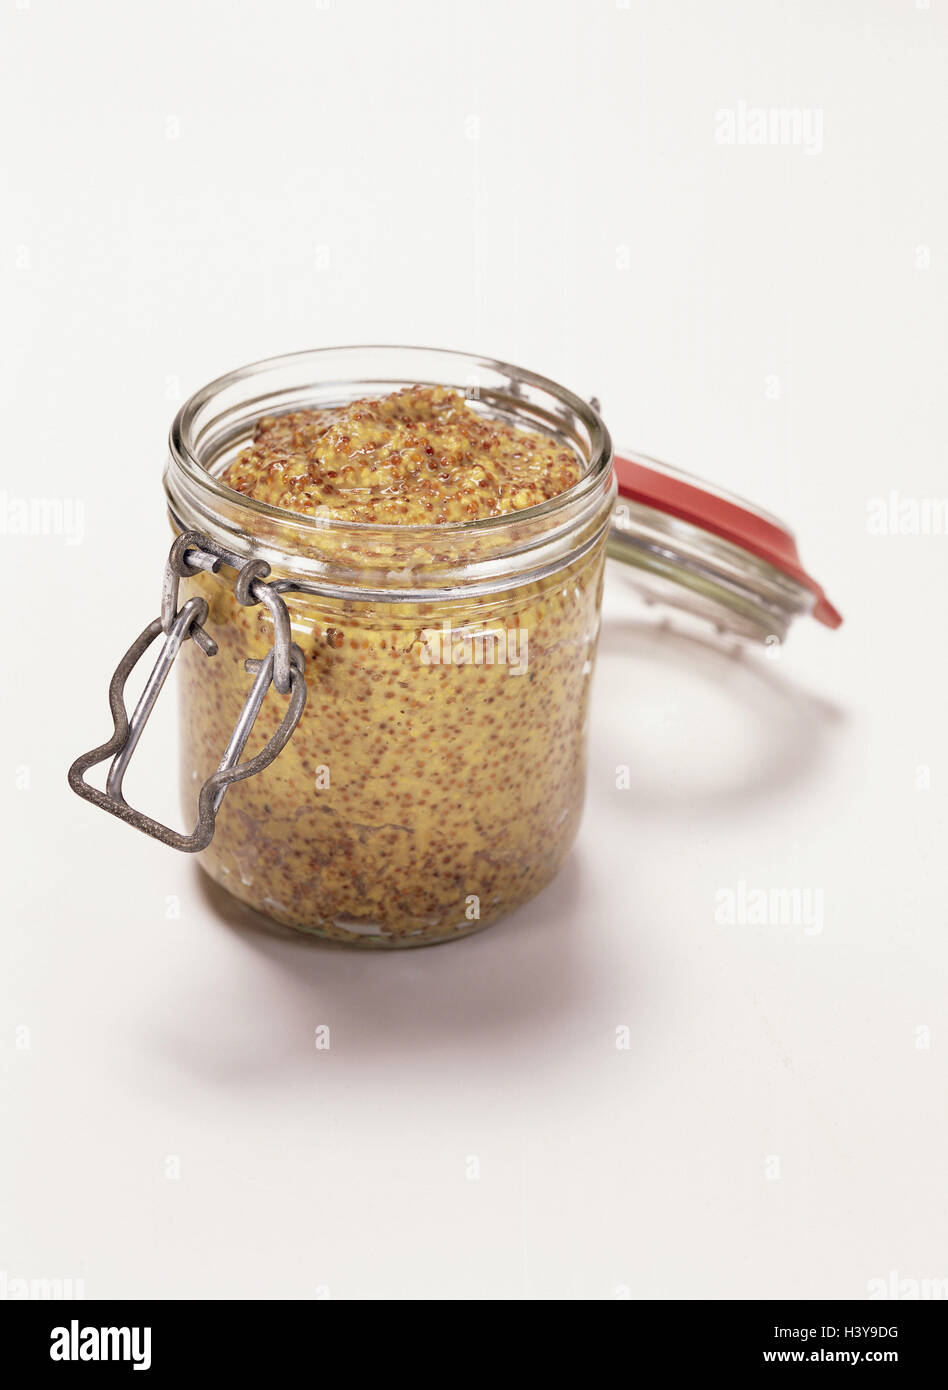 Preserving jar, mustard, coarse grained mustard glass, preserving jar, glass, stock glass, mustard seed, spice, - Stock Image